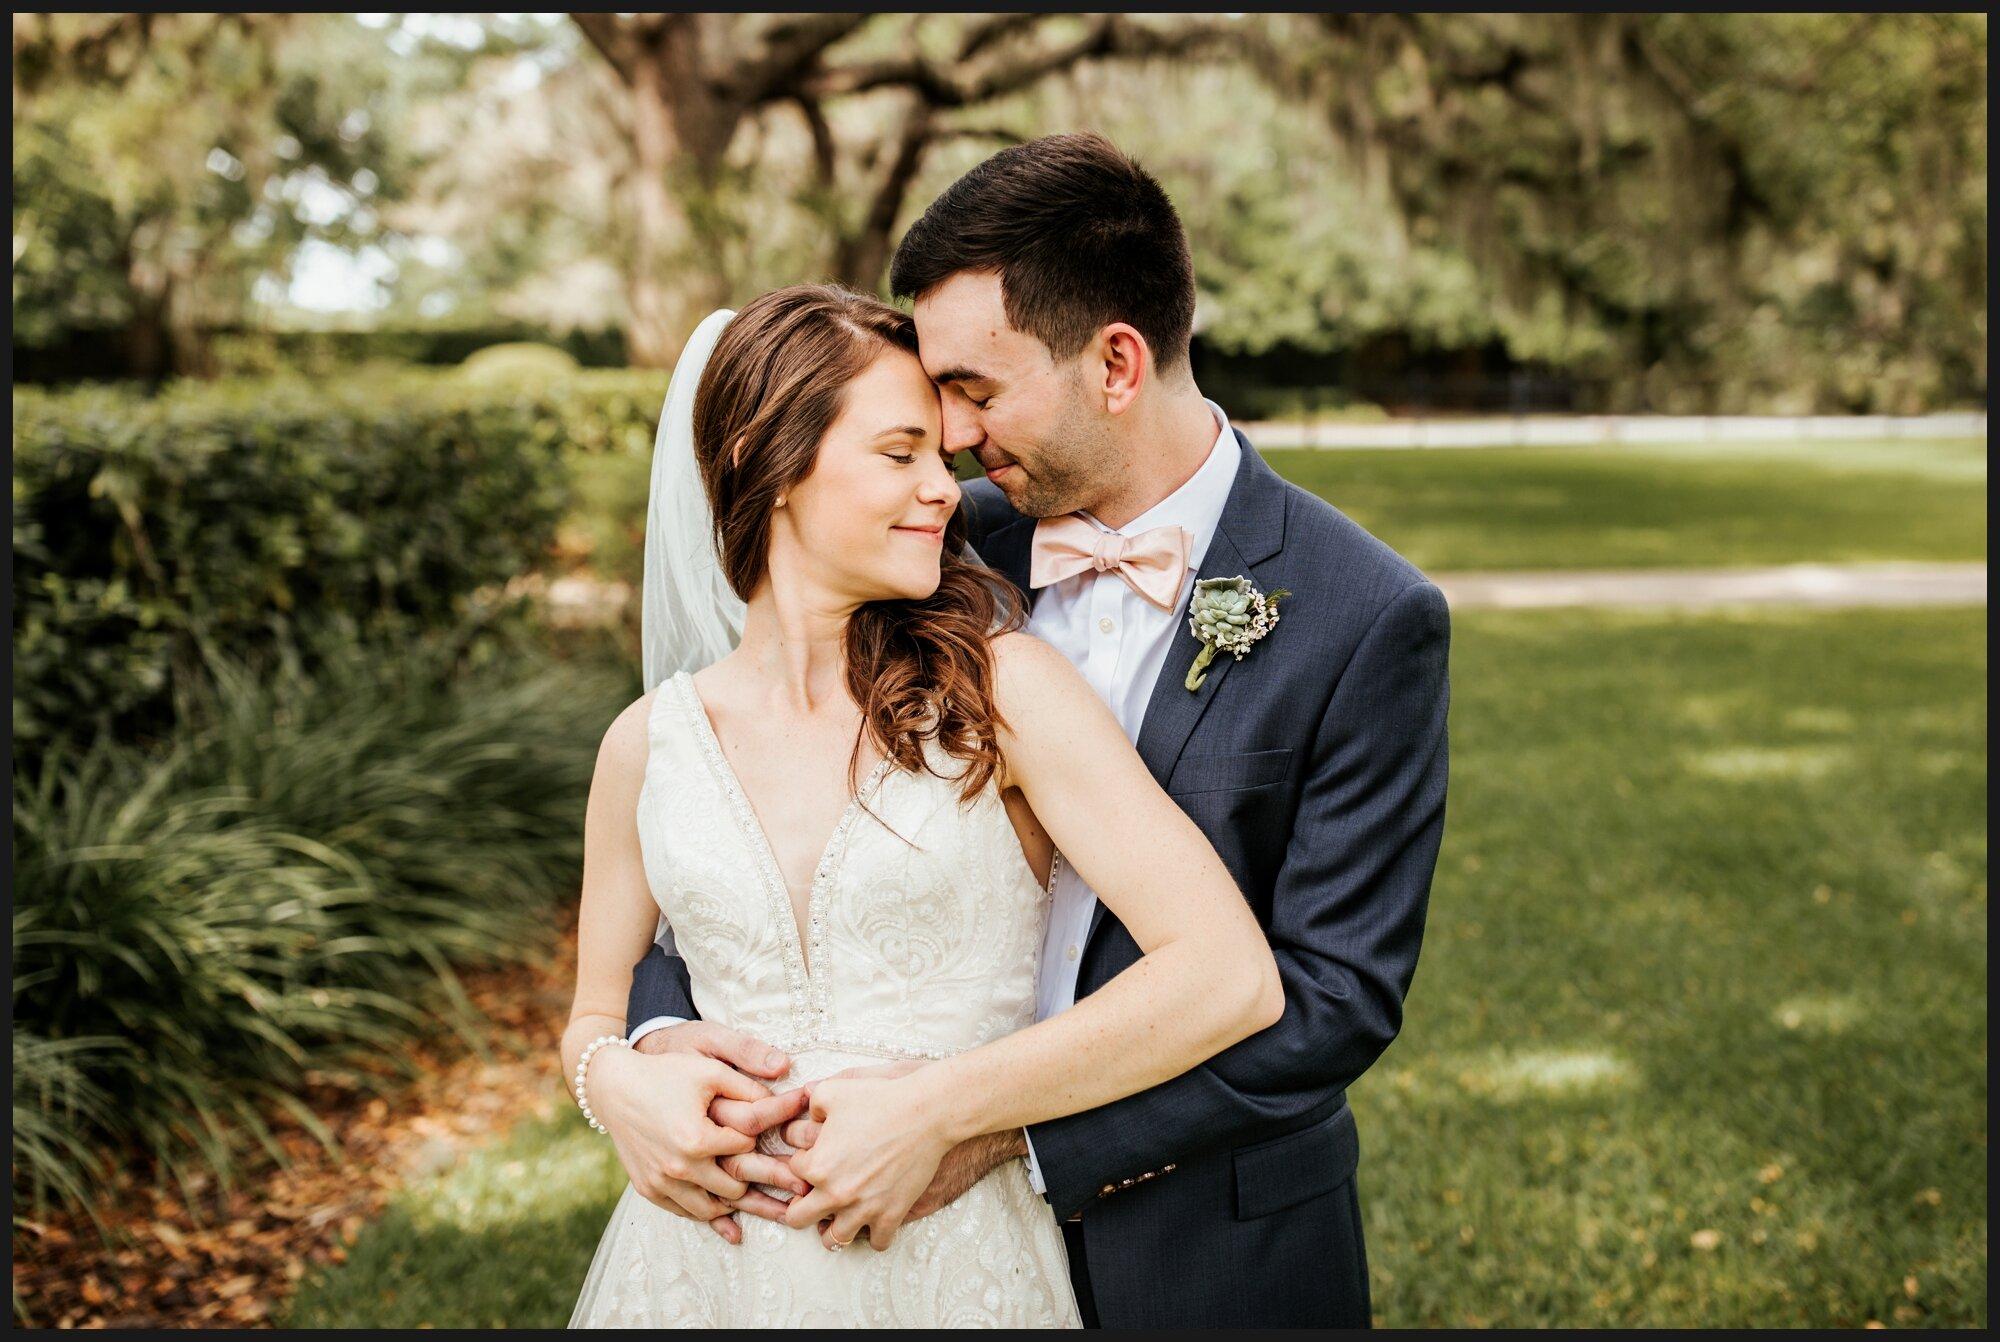 Orlando-Wedding-Photographer-destination-wedding-photographer-florida-wedding-photographer-hawaii-wedding-photographer_0666.jpg